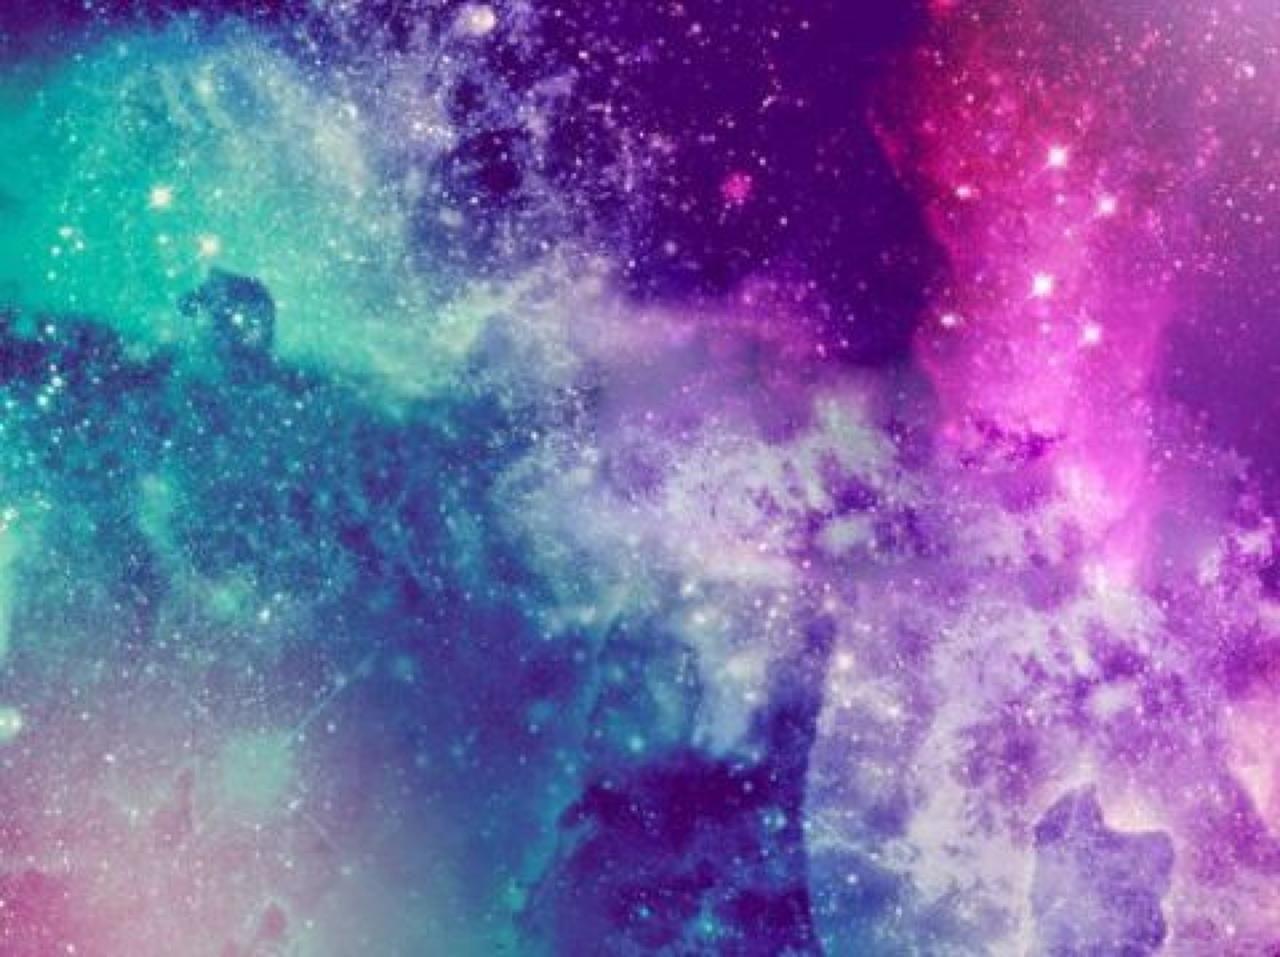 galaxy wallpapers full hd | astronomy | pinterest | wallpaper